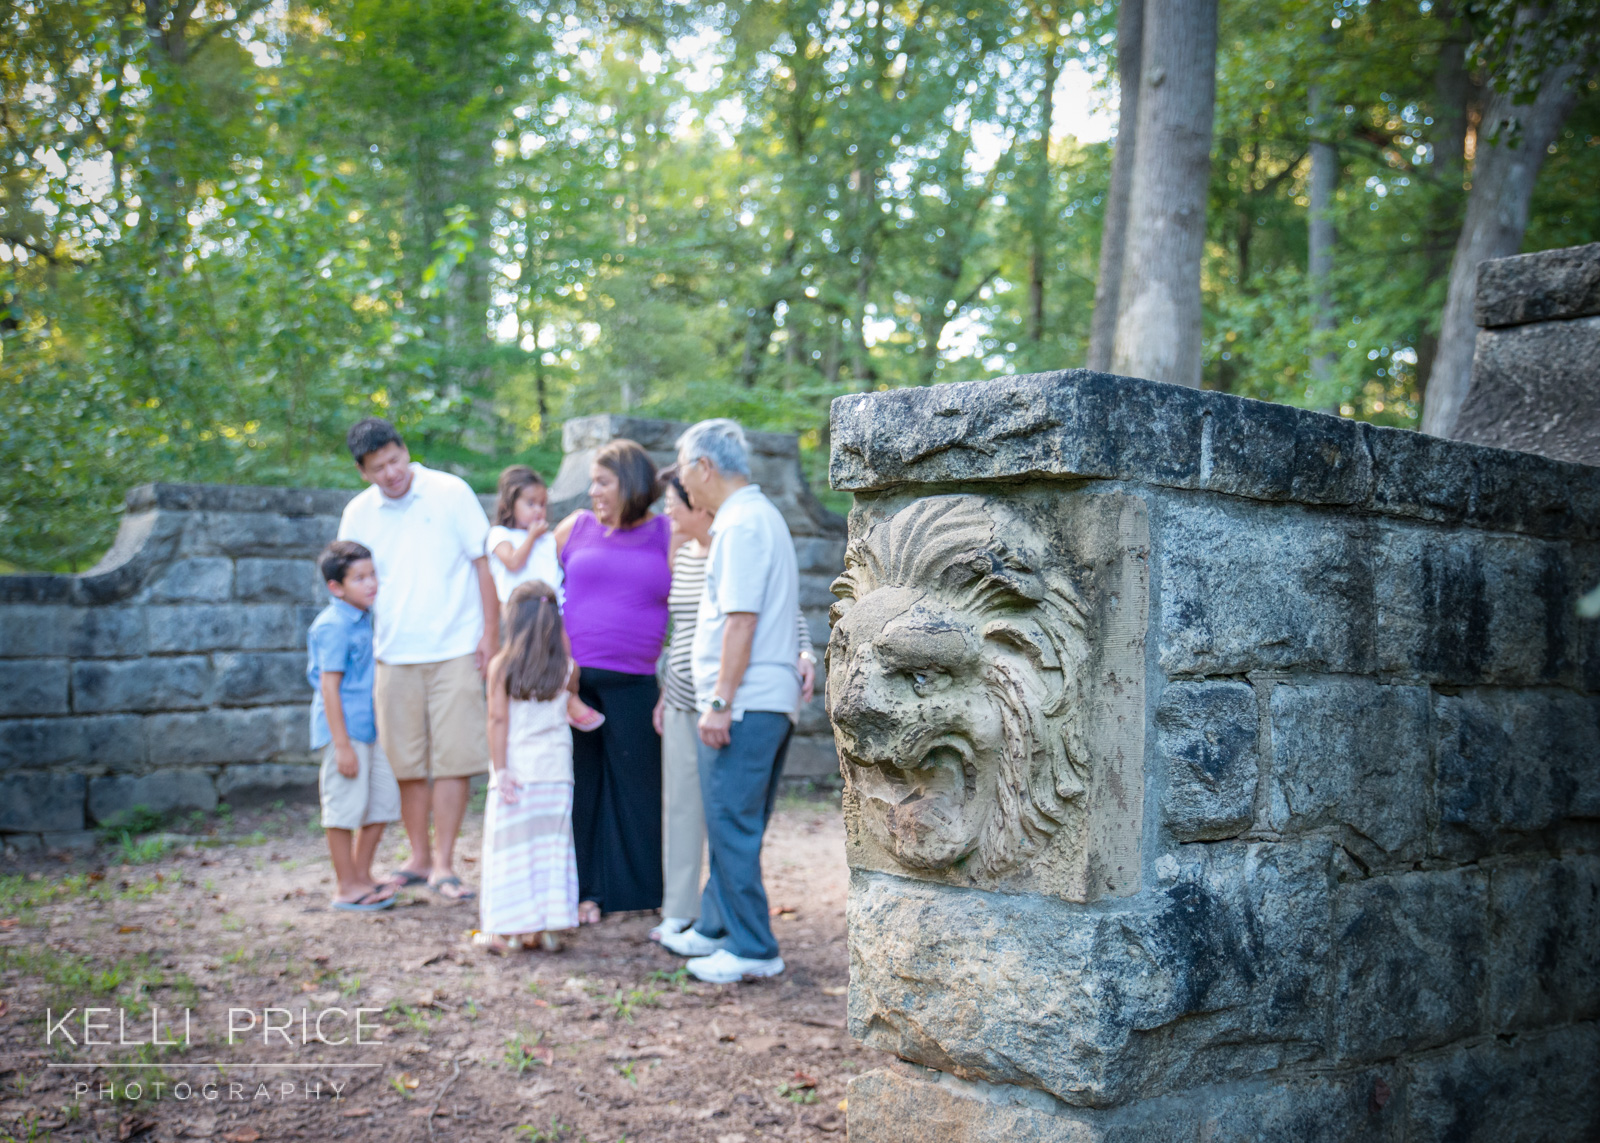 Extended Family Digital Photography in Atlanta